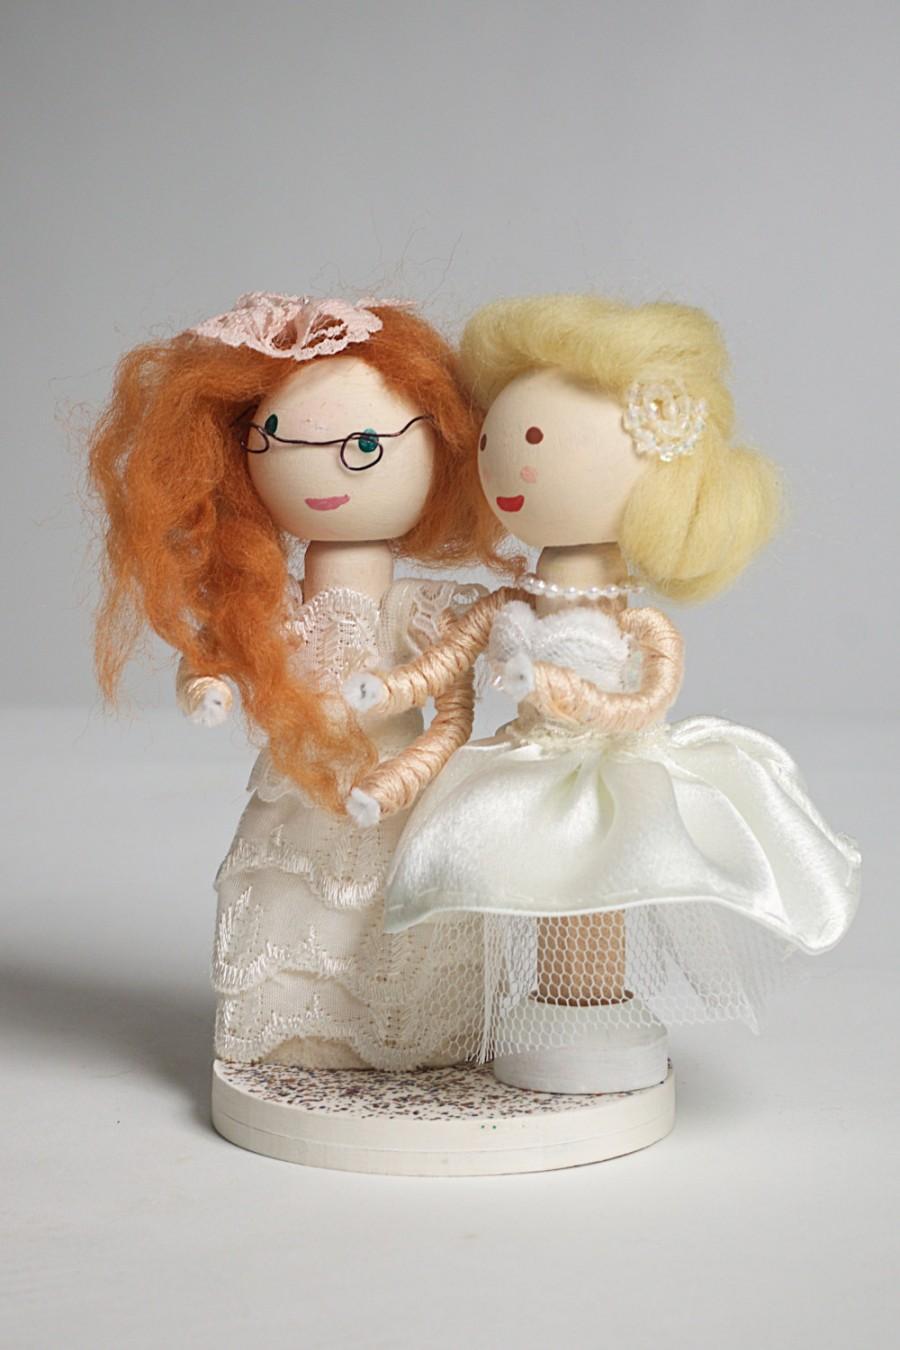 Hochzeit - Handmade, Customized, Bride and Groom, Wooden Peg Doll, Wedding Cake Topper